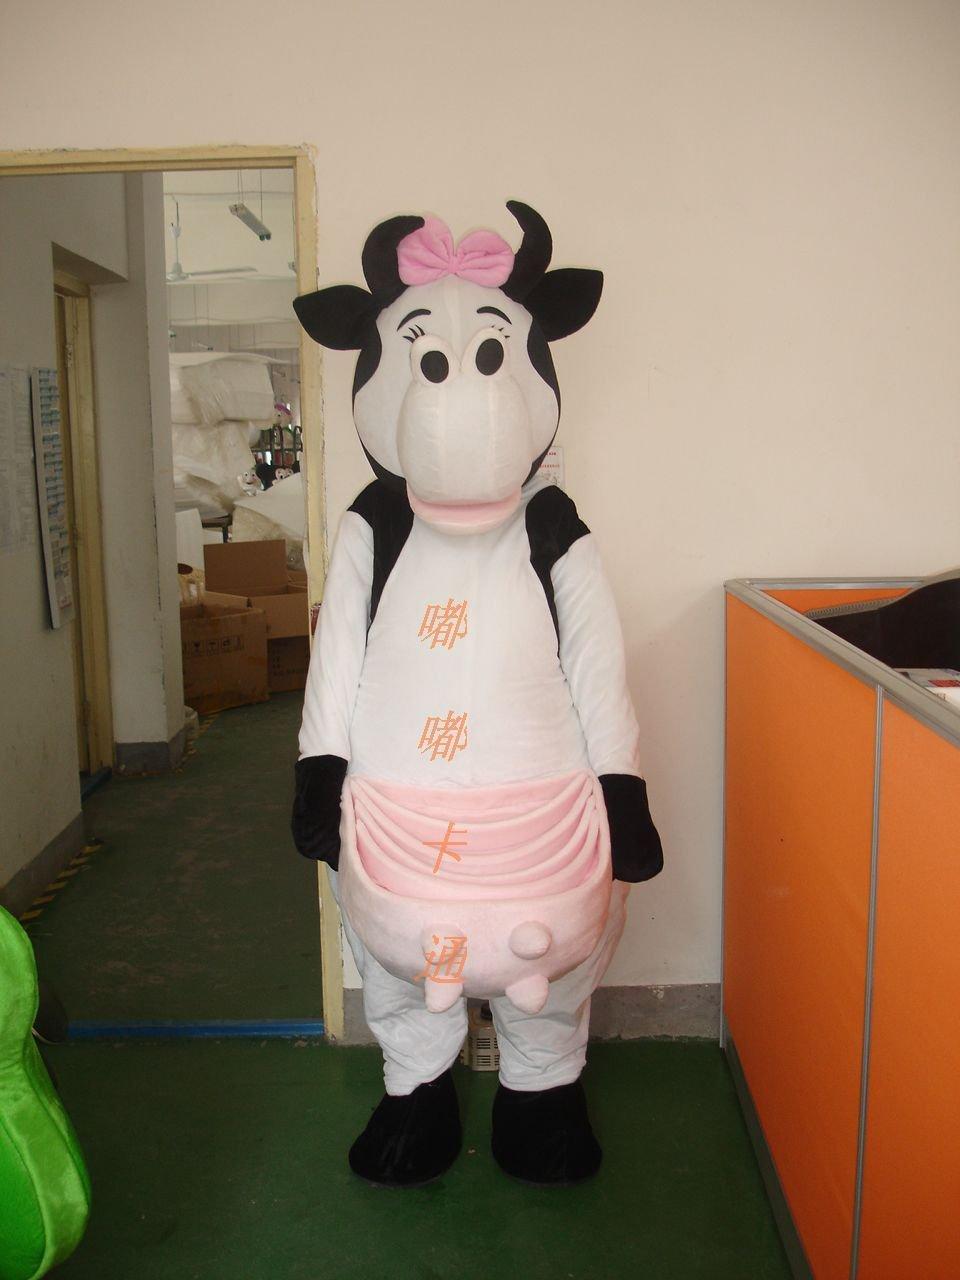 Cartoon Doll Clothing Doll Clothing Walking Cartoon Cartoon Cows New Zealand Mascot Costume